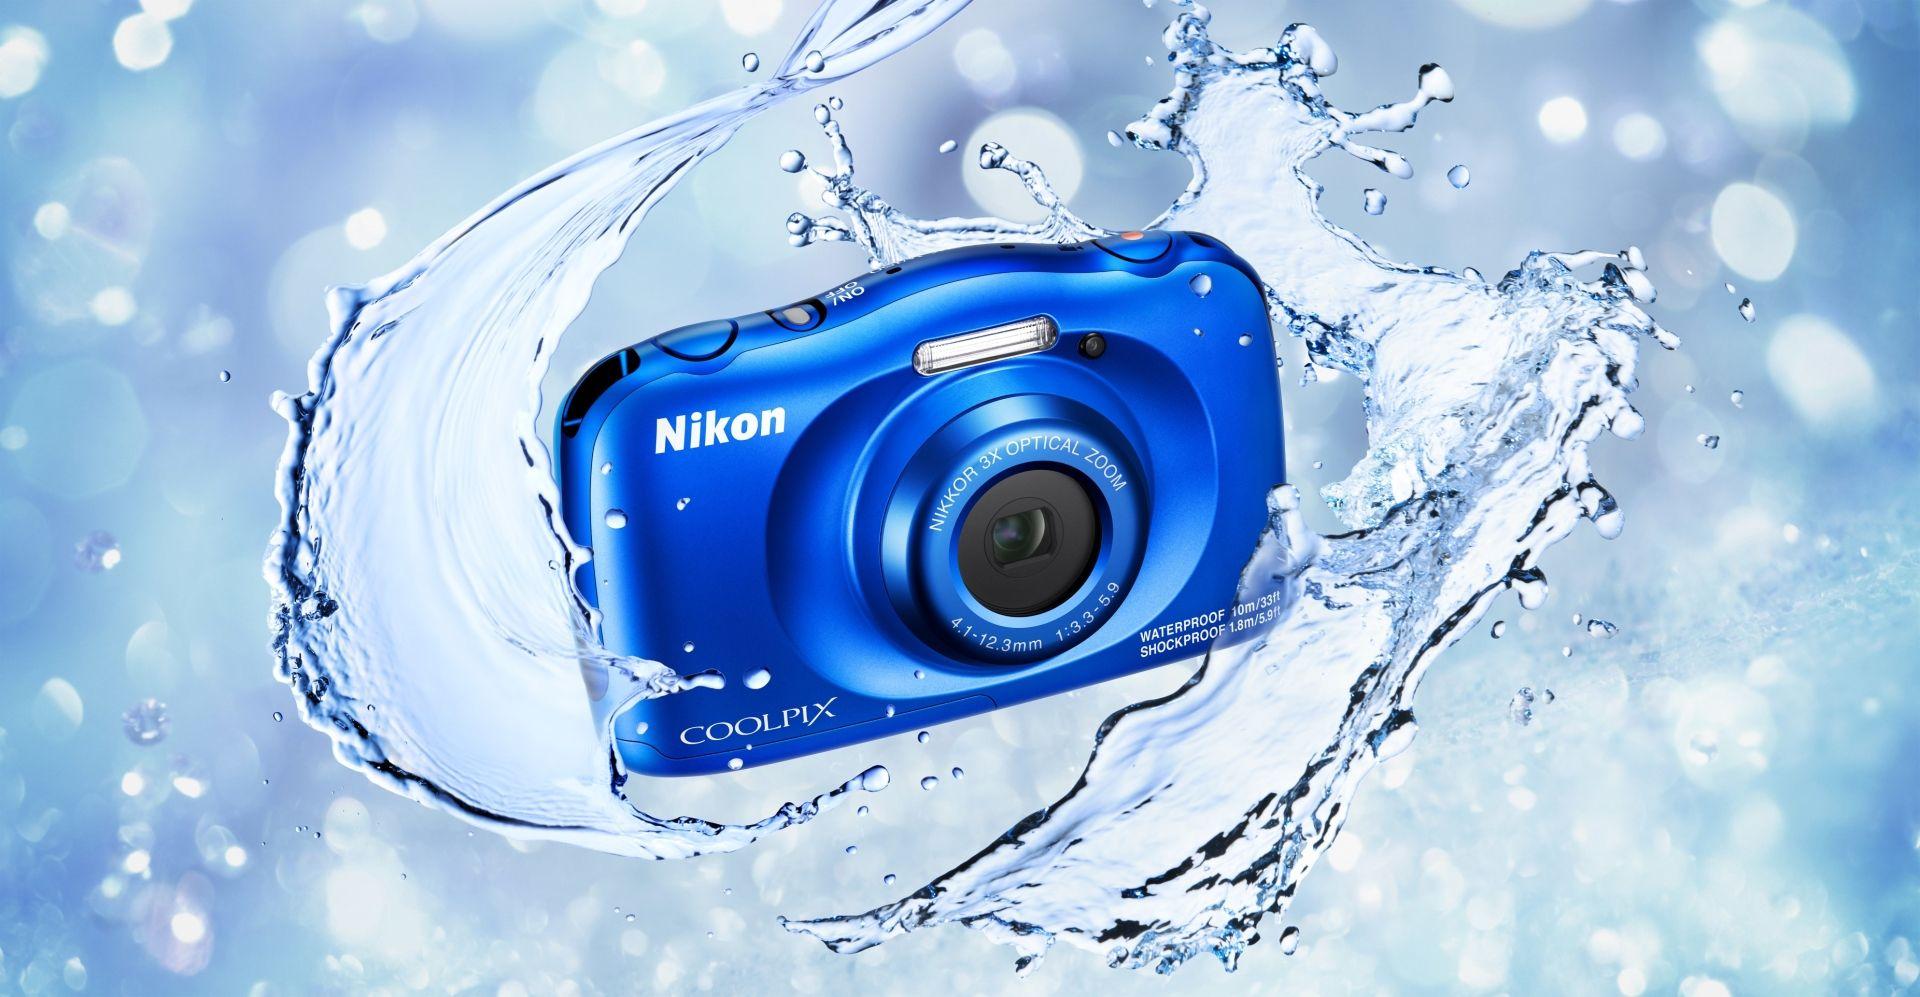 Nikon Coolpix W150: A budget compact camera with tough